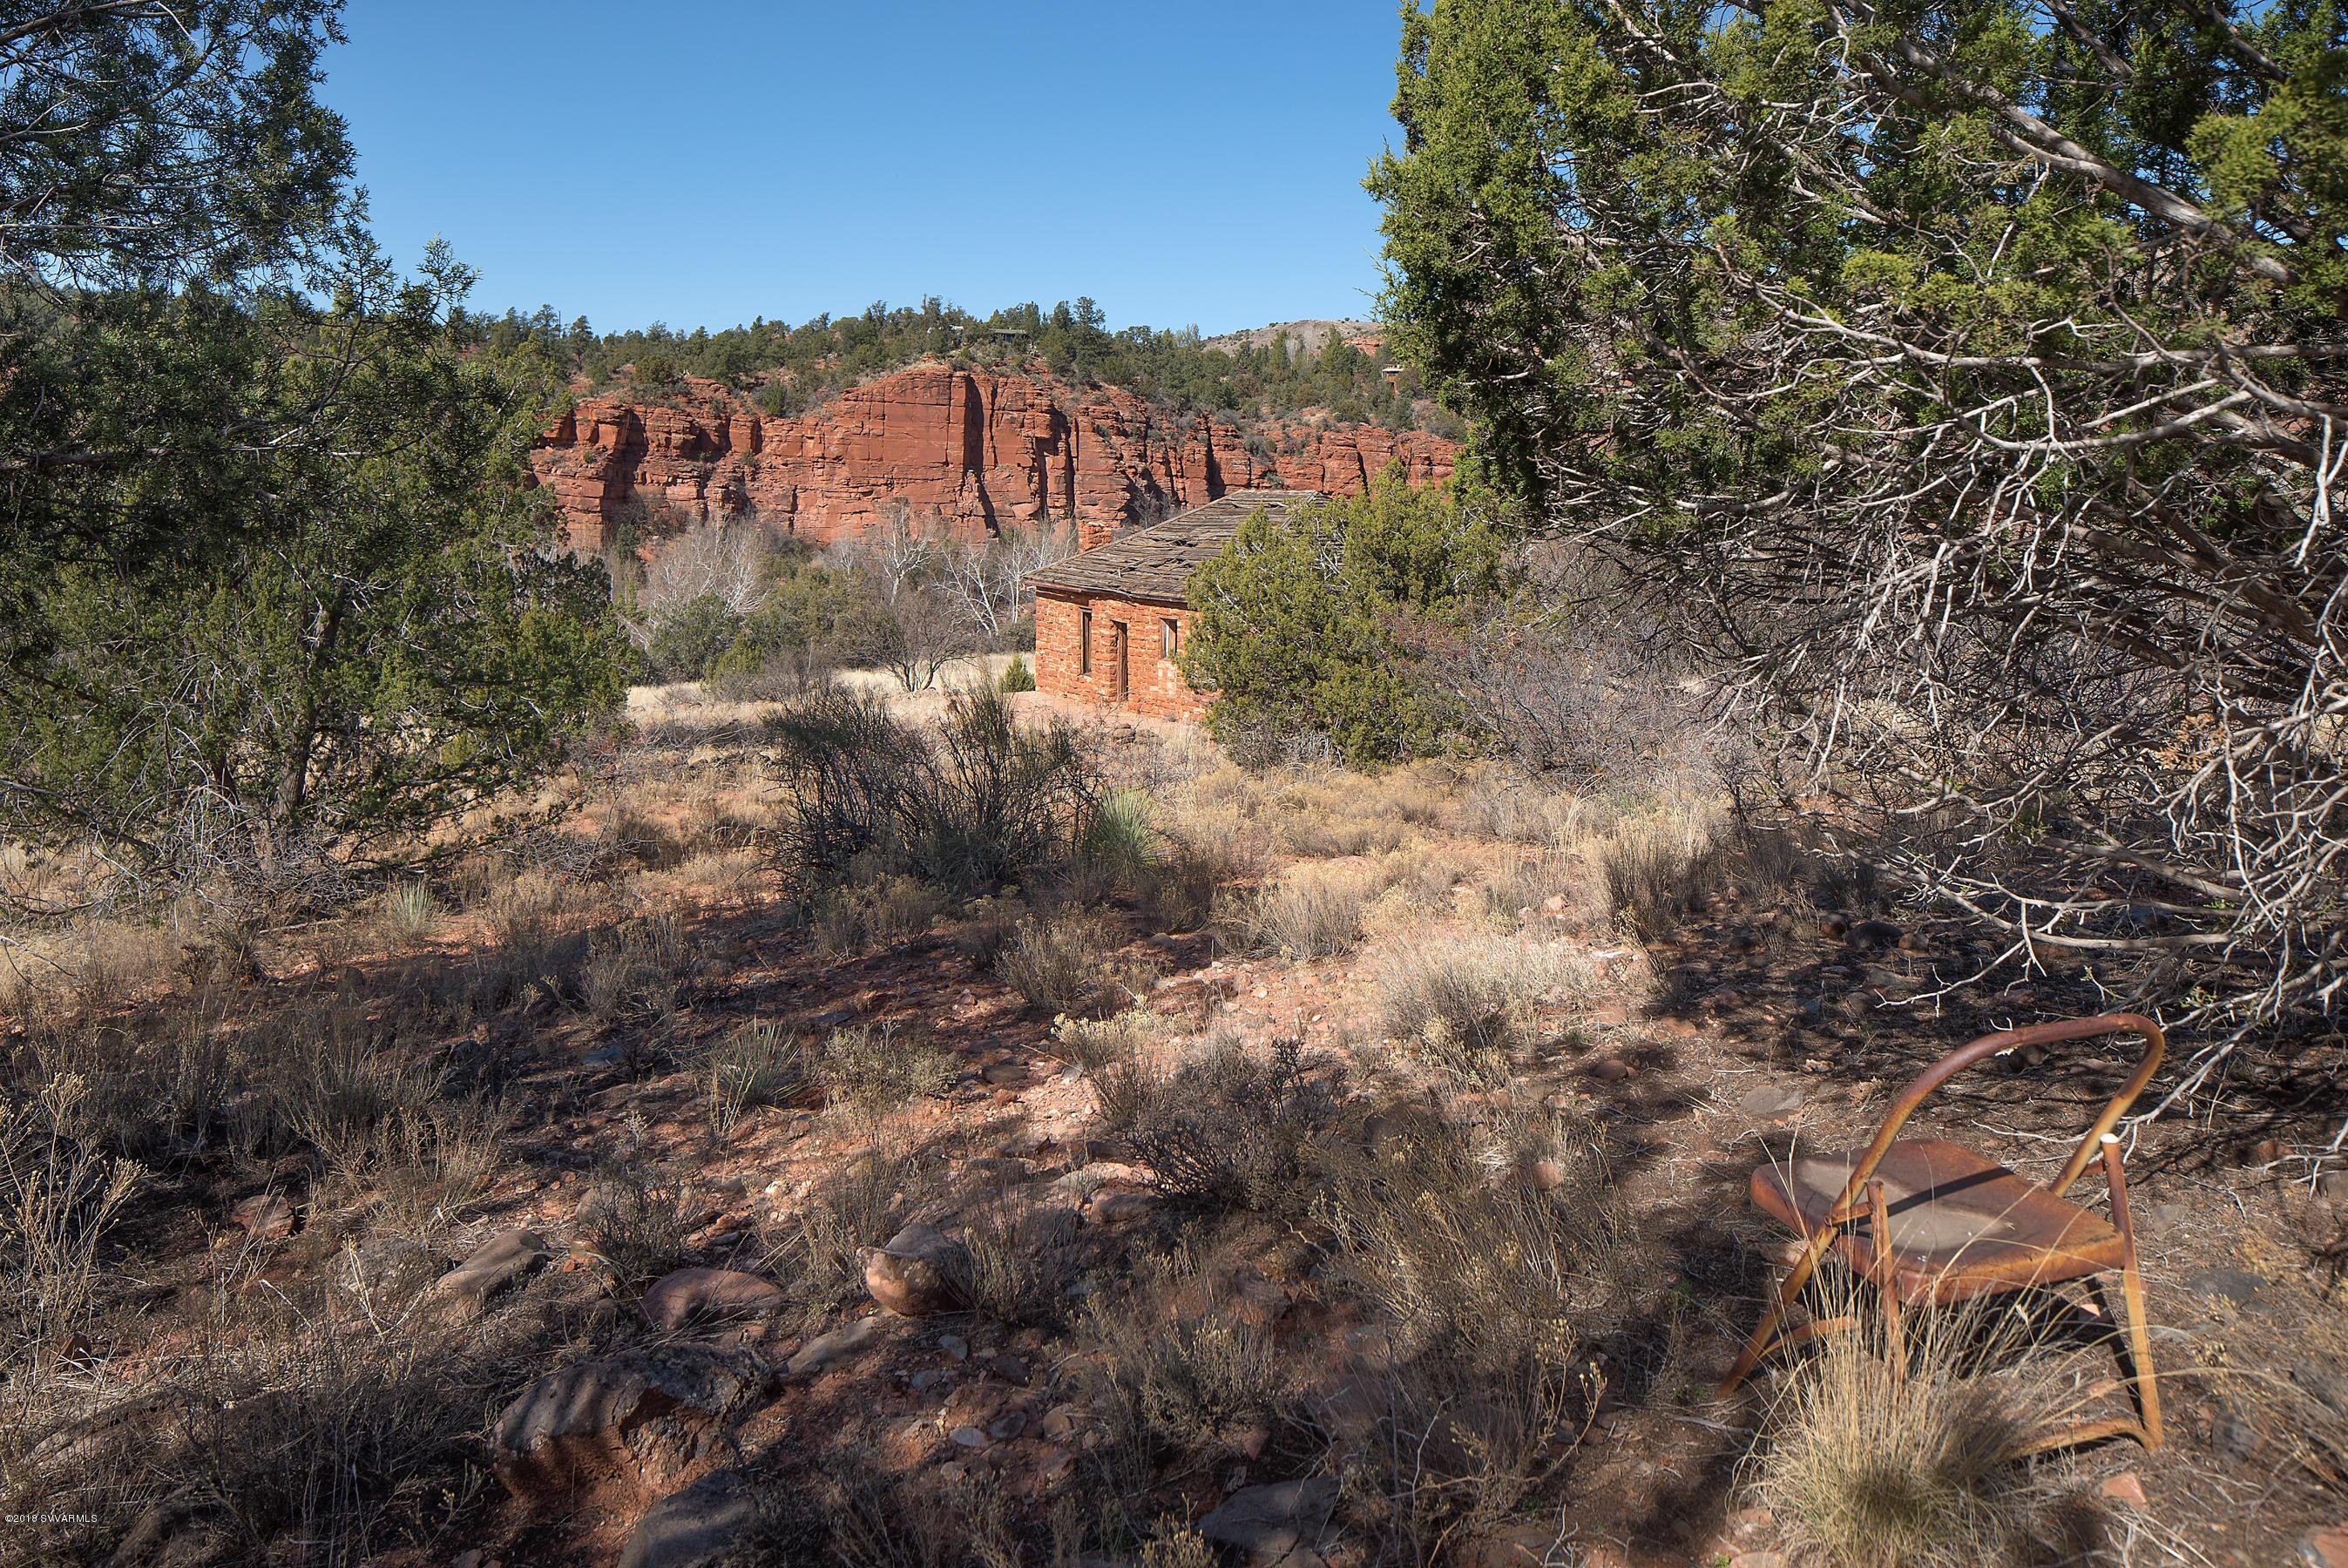 2 Horseshoe Bend Sedona, AZ 86351